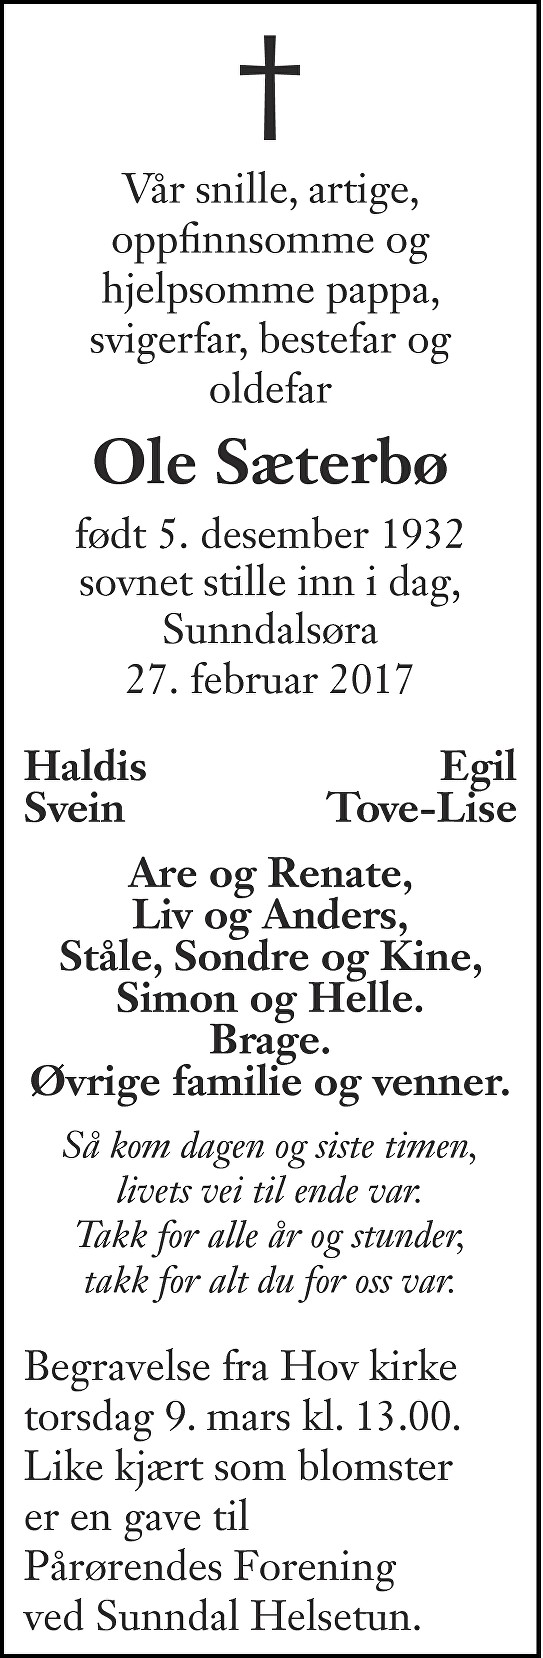 Ole Sæterbø Dødsannonse